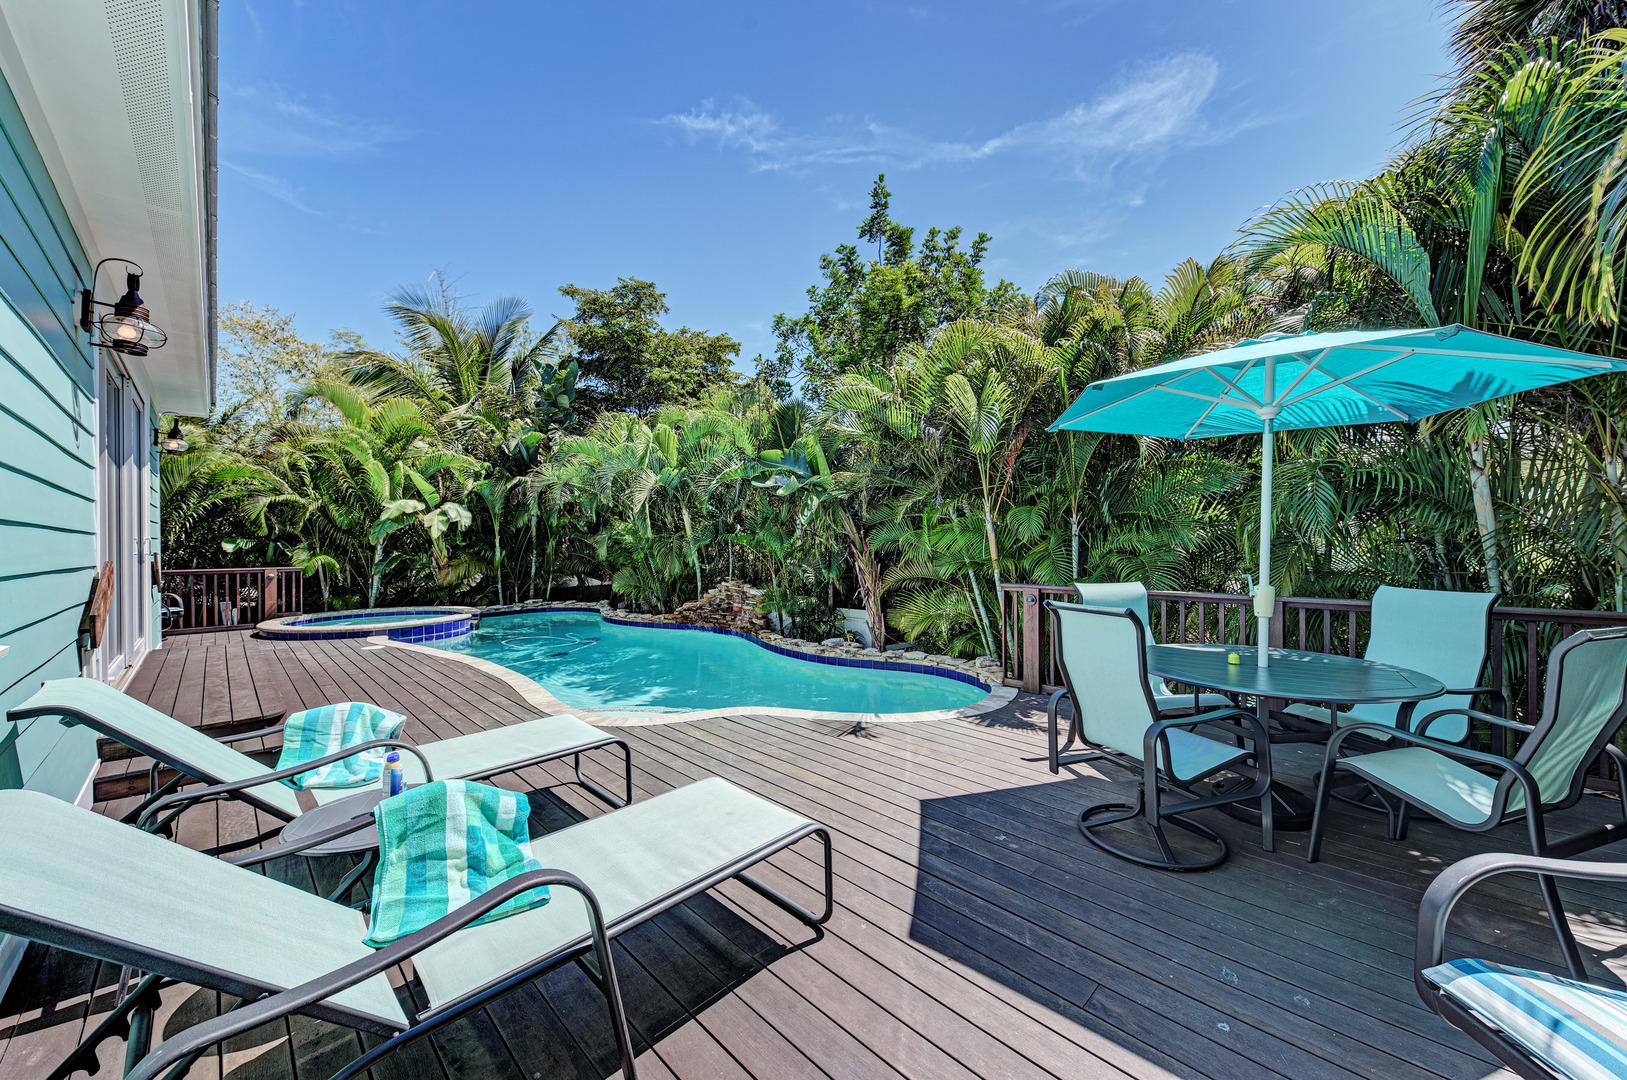 Blue Palm Paradise pool deck